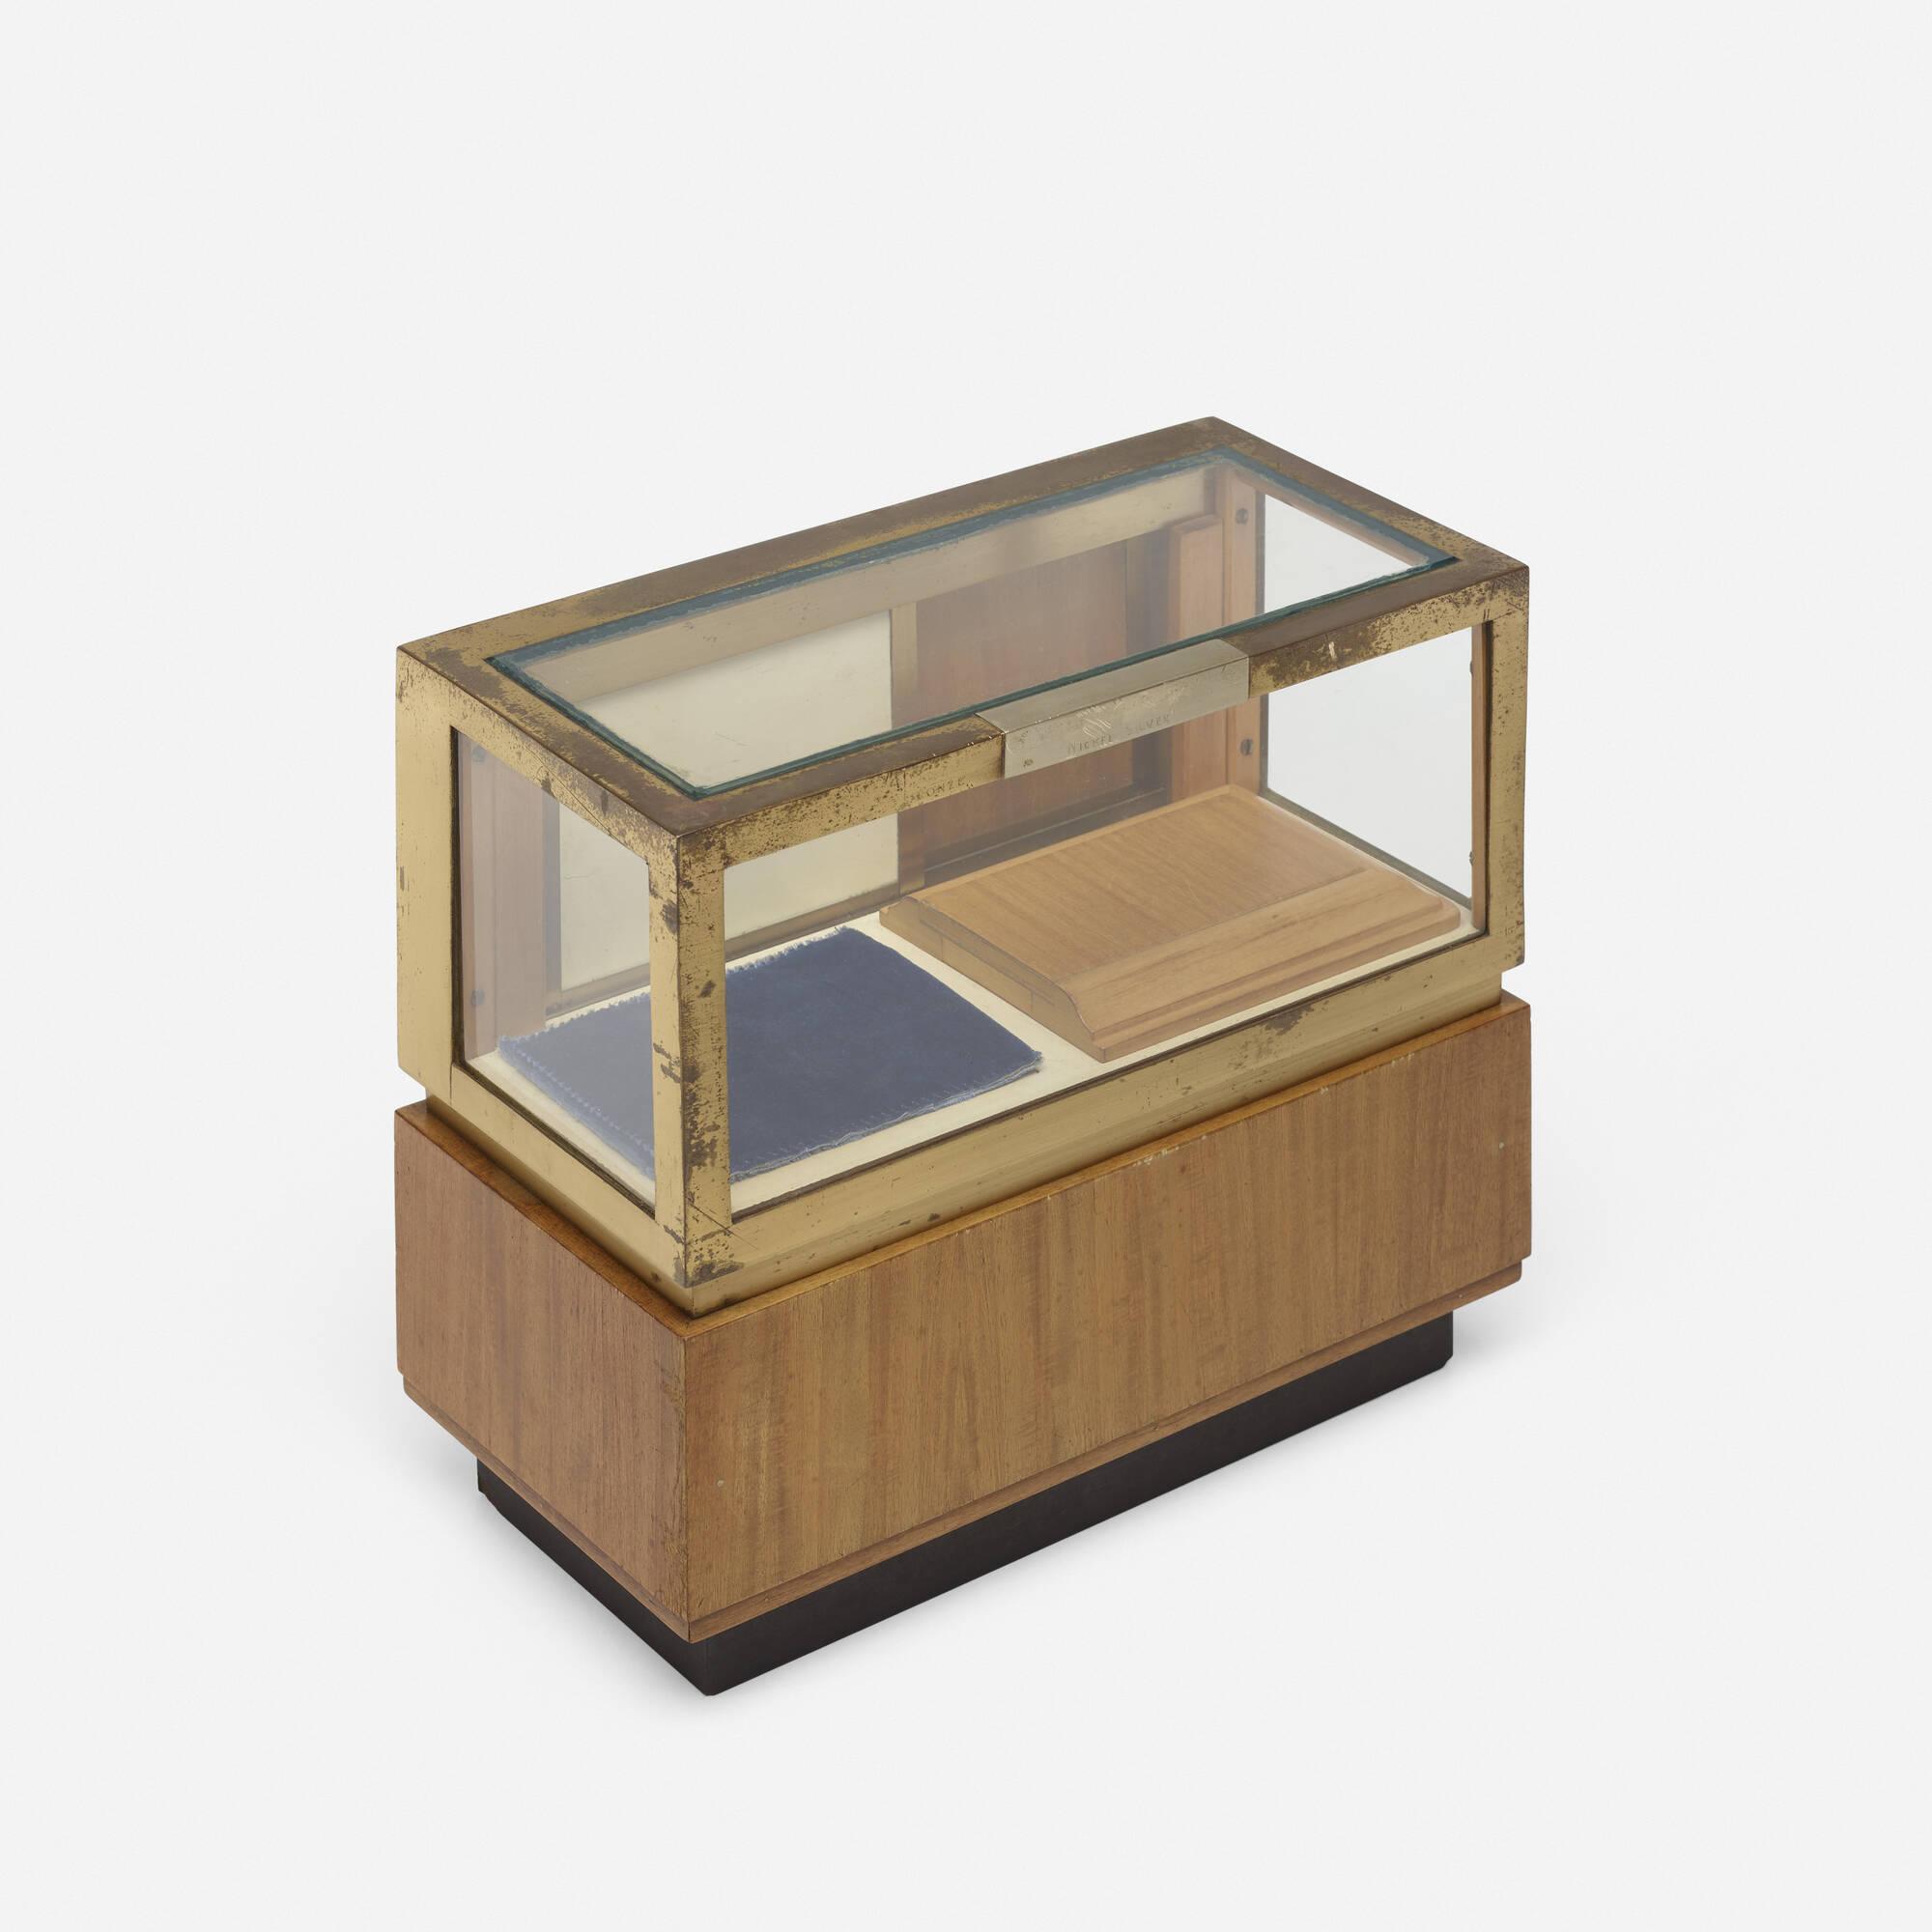 248: American / salesman's sample vitrine (1 of 2)